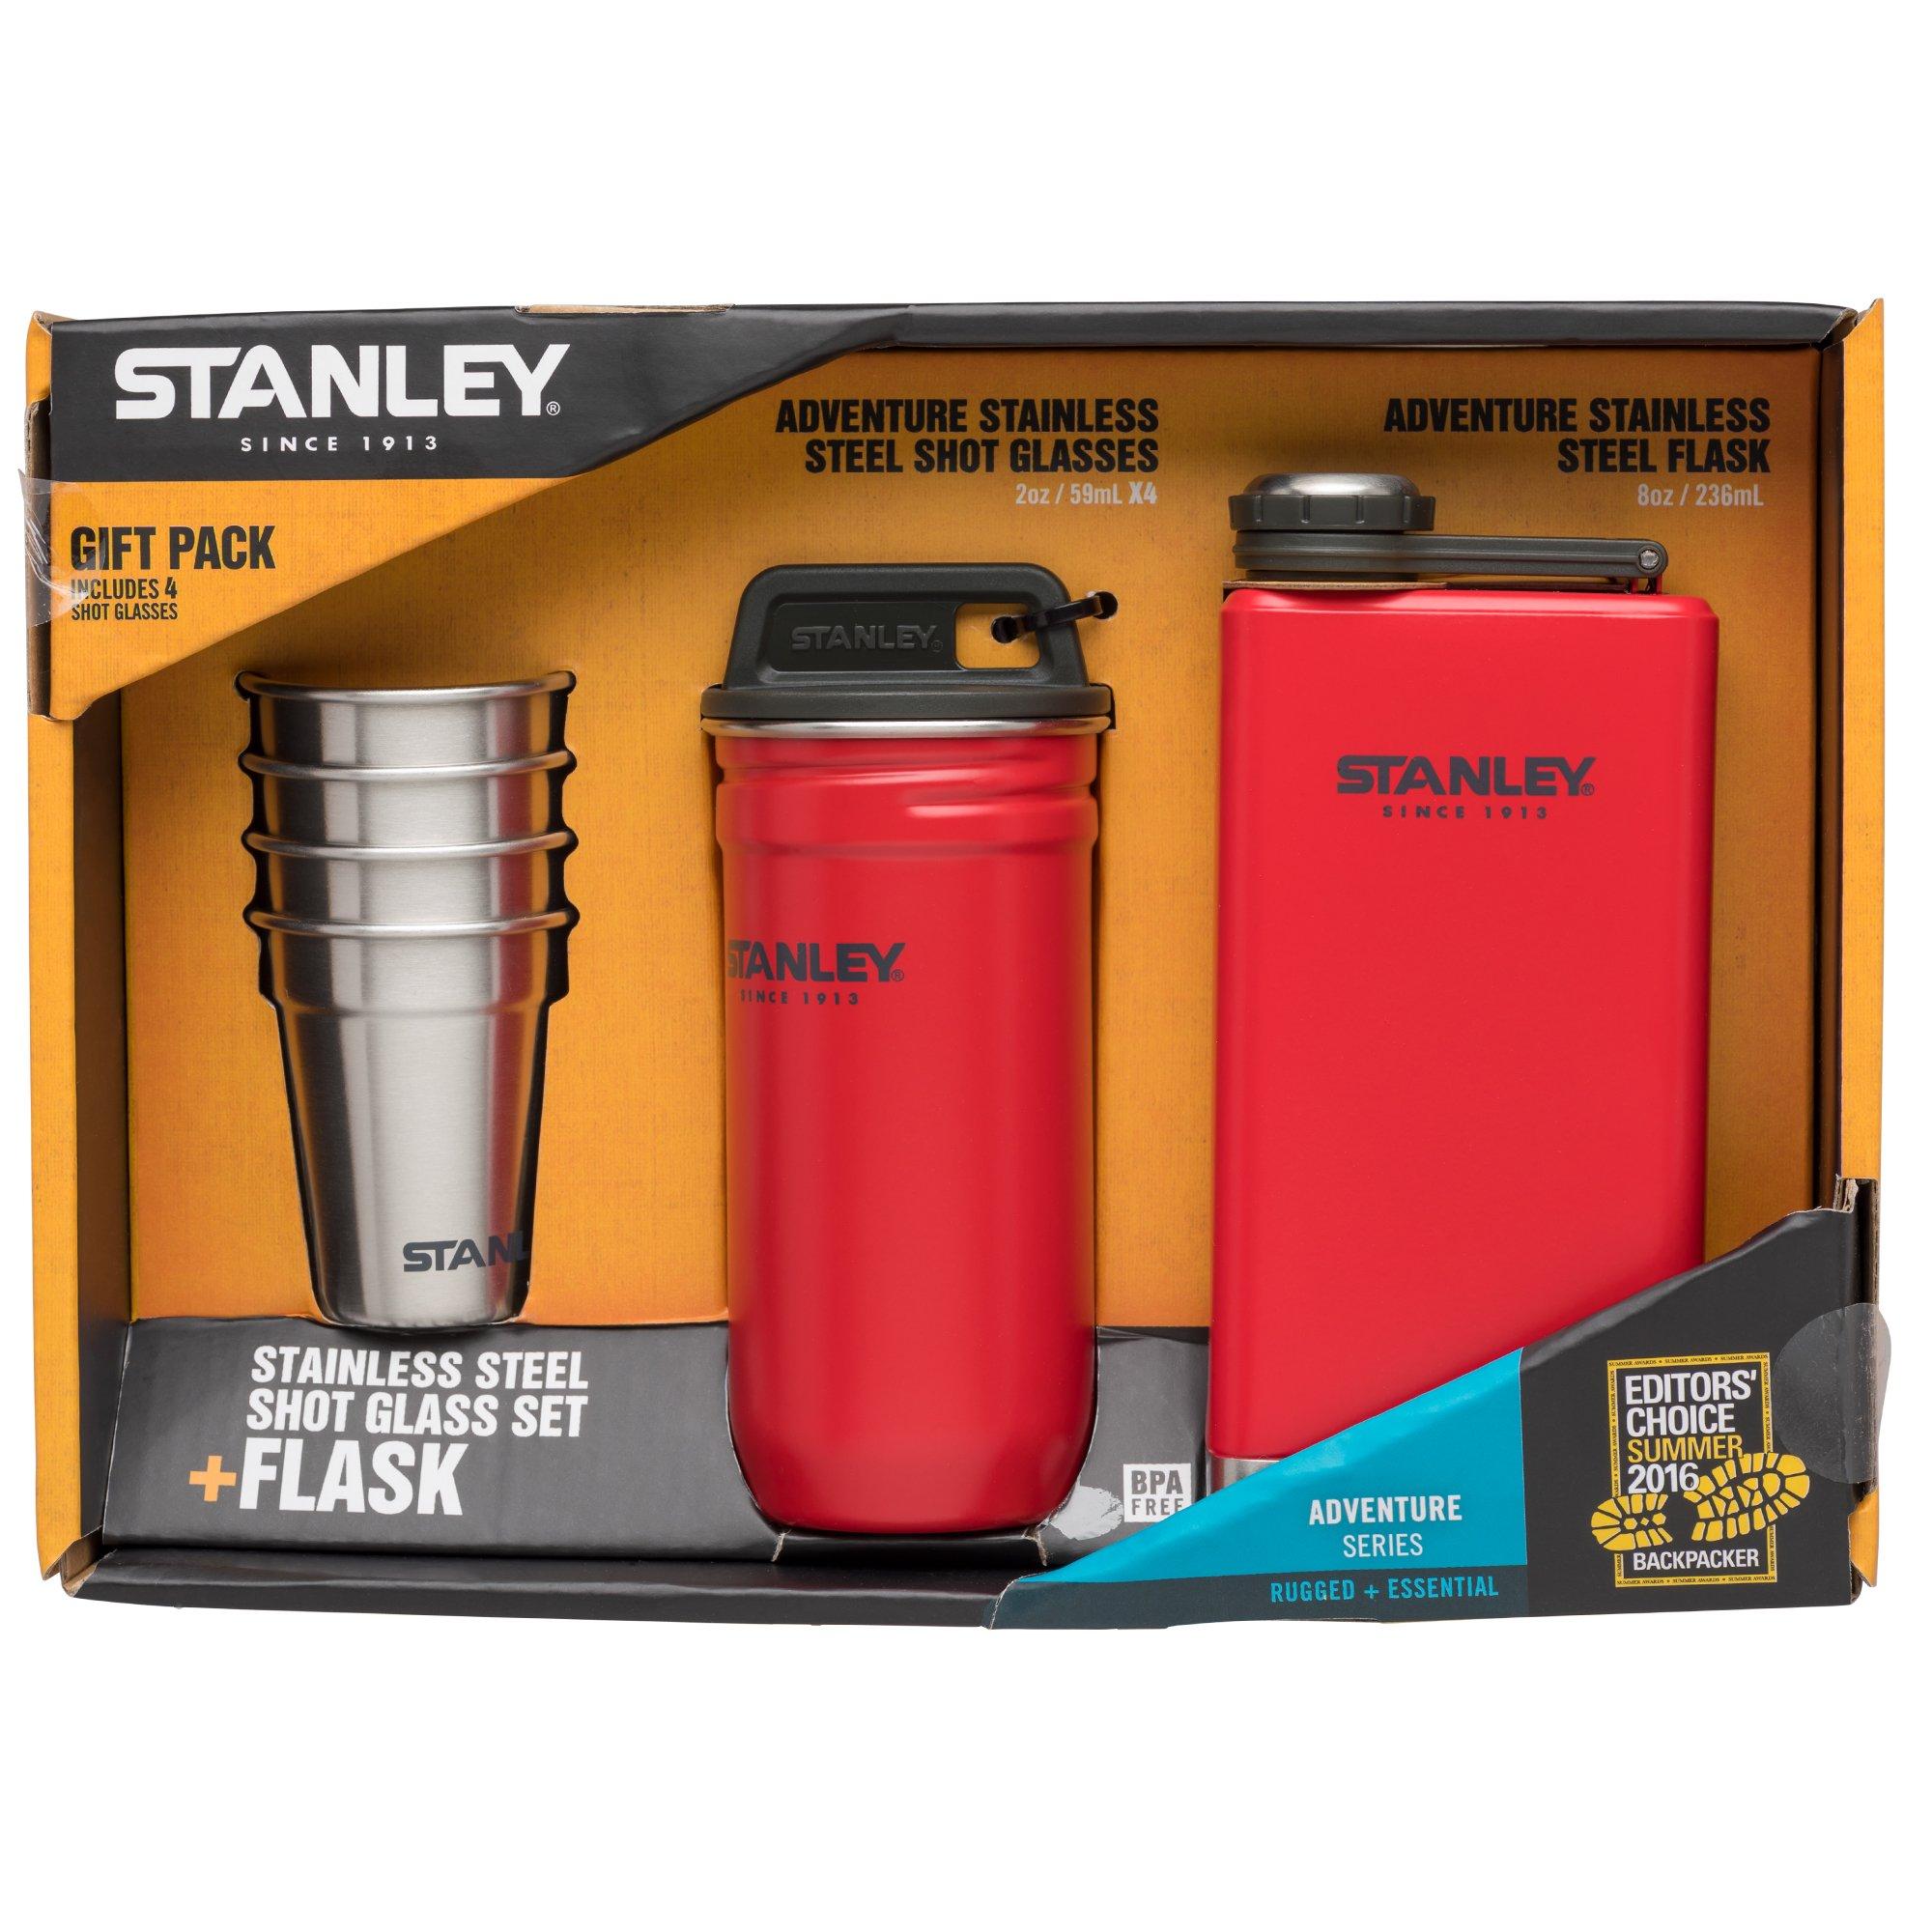 Stanley Adventure Steel Shots + Flask, Gift Set, Flannel Red